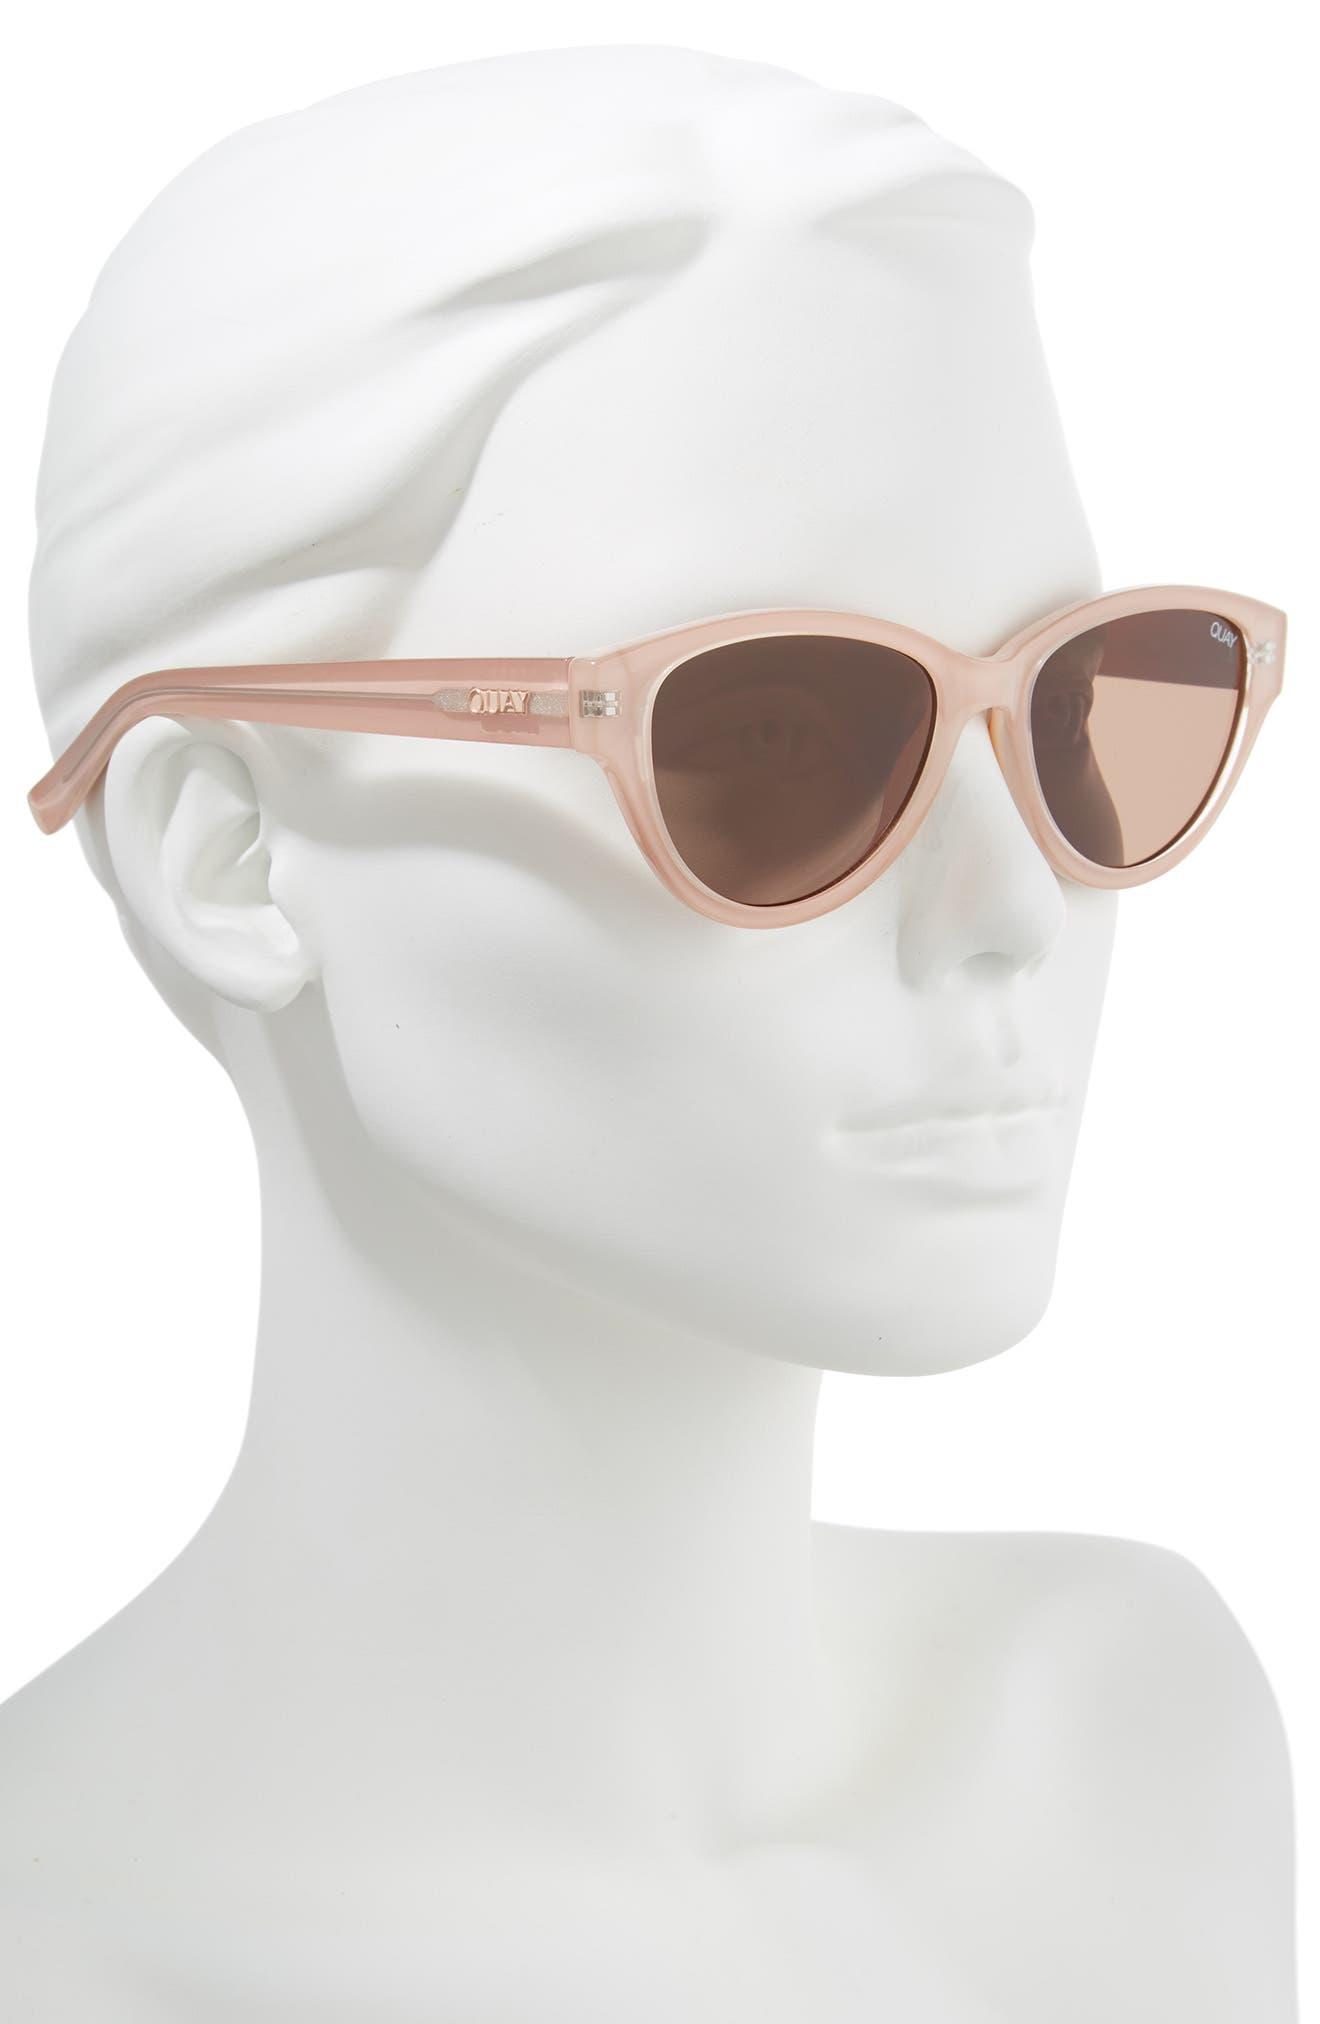 Rizzo 55mm Cat Eye Sunglasses,                             Alternate thumbnail 2, color,                             CREAM/ BROWN